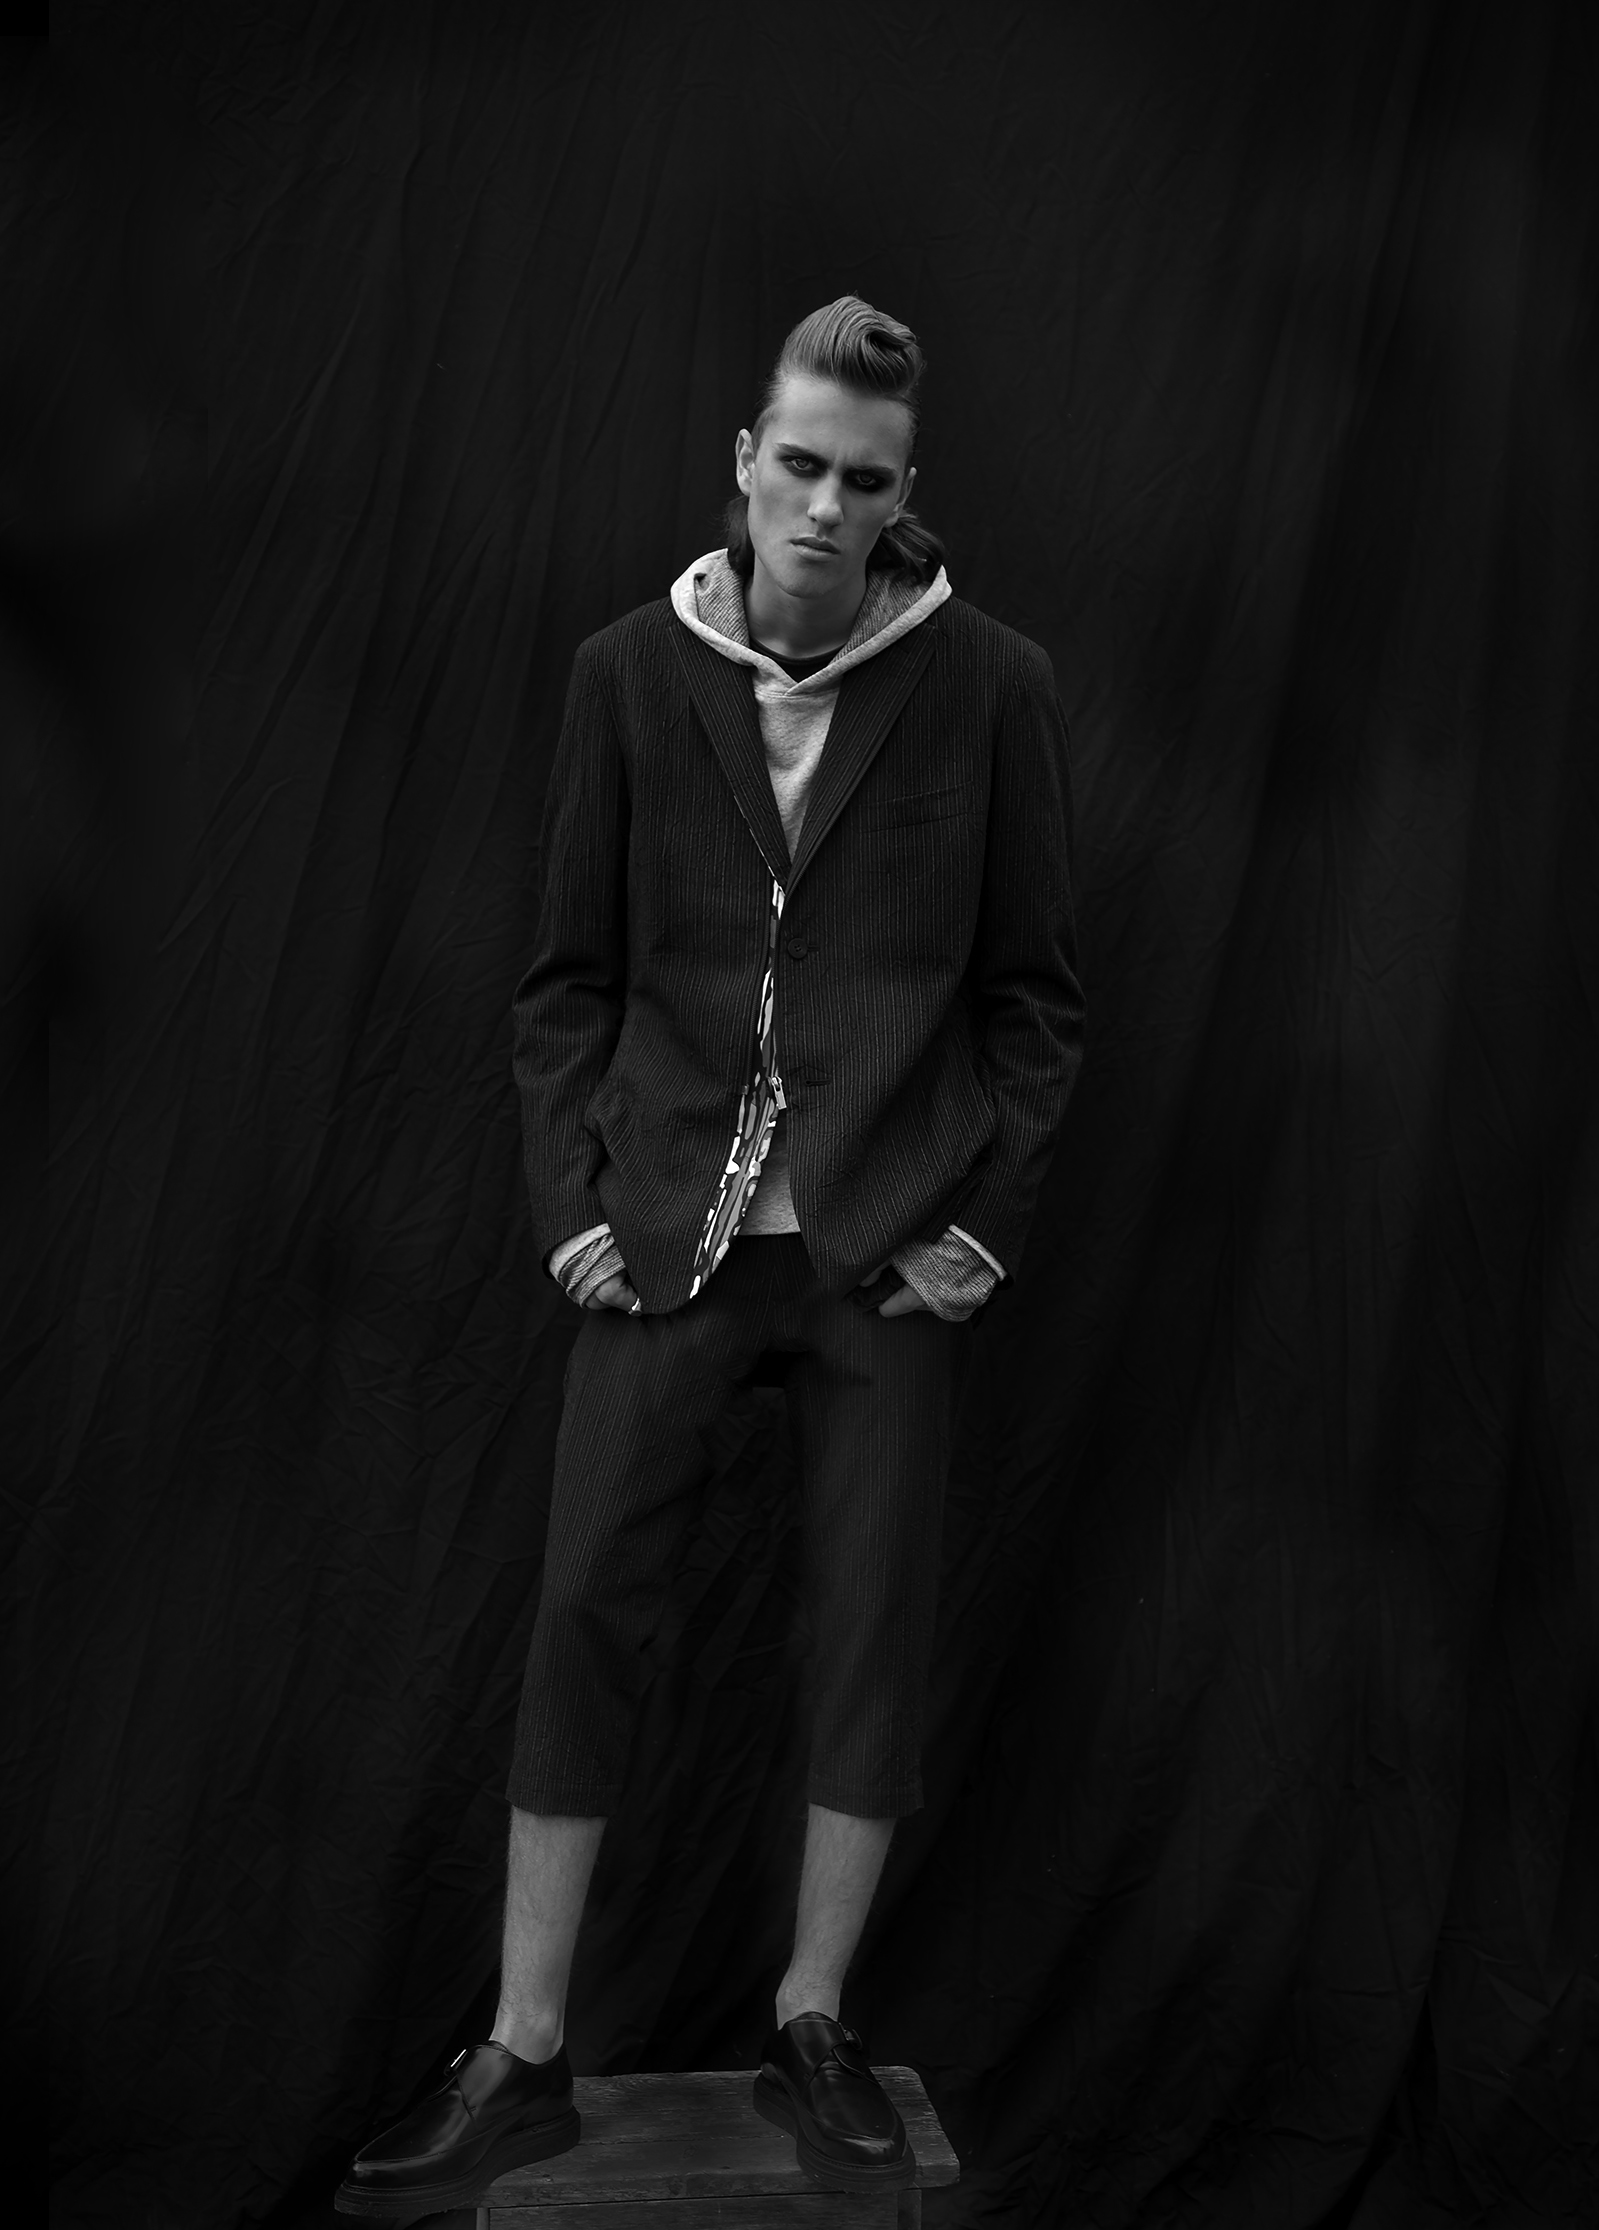 Veste et pantalon: ISSEY MIAKE Sweet : ALLSSAINTS Chaussures: KARL LAGERFELD